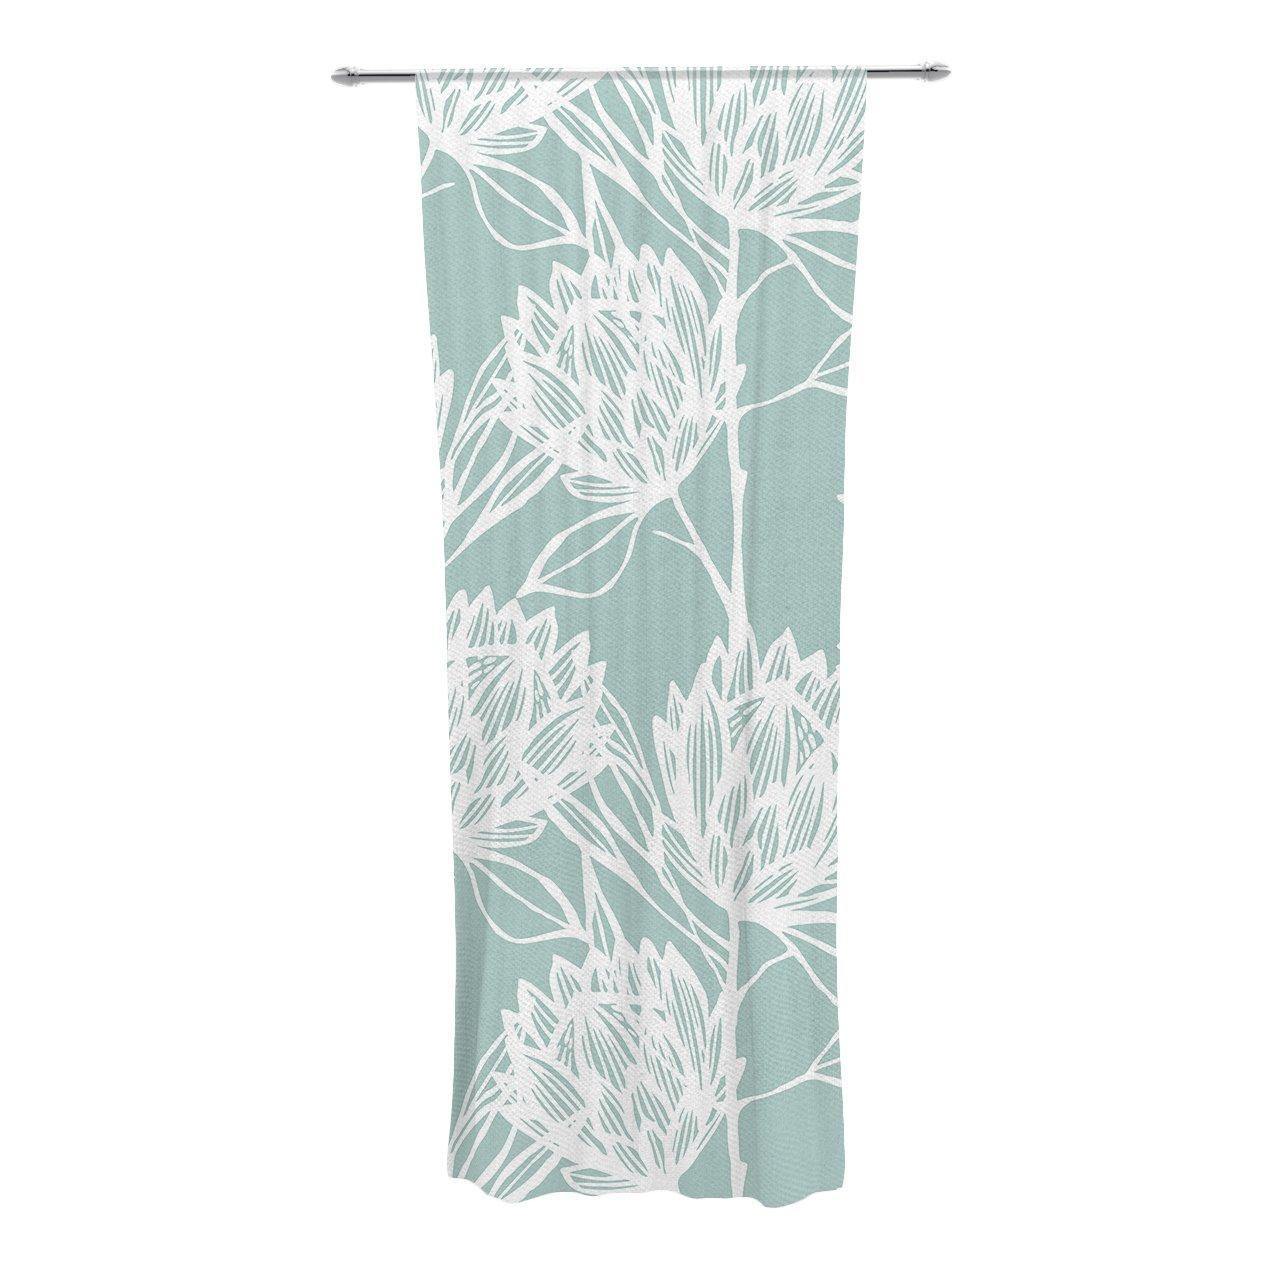 Kess InHouse Kess Original Namaste in Bed Teal Blue White Decorative Set 30 x 84 Sheer Curtains